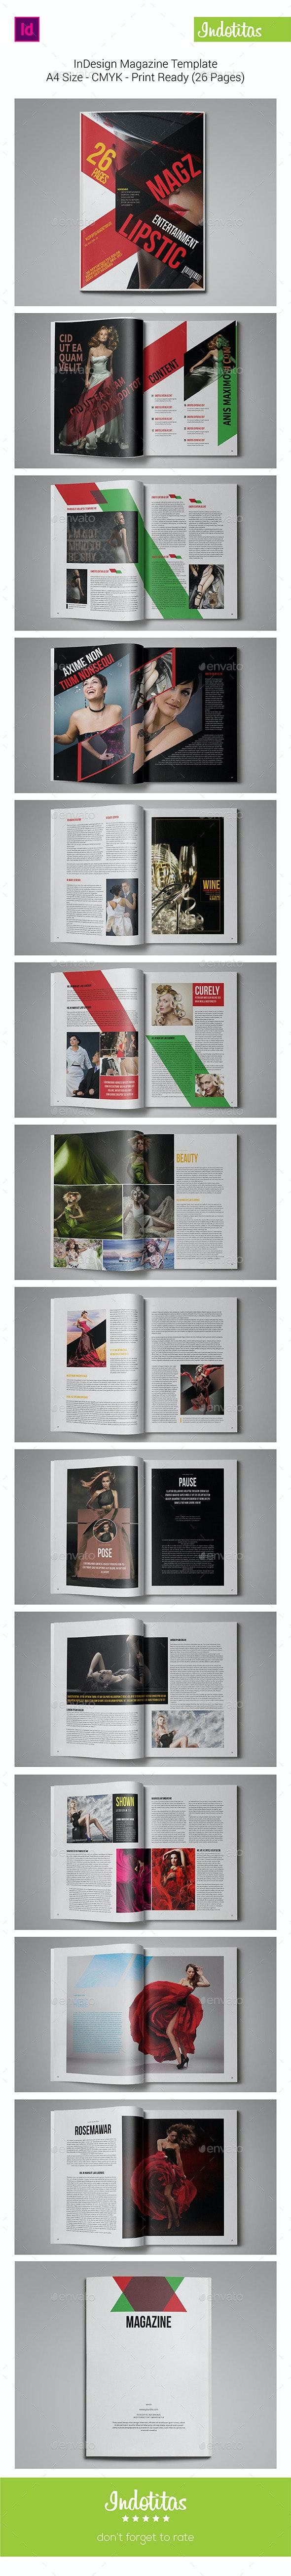 InDesign MagazineTemplate - Magazines Print Templates